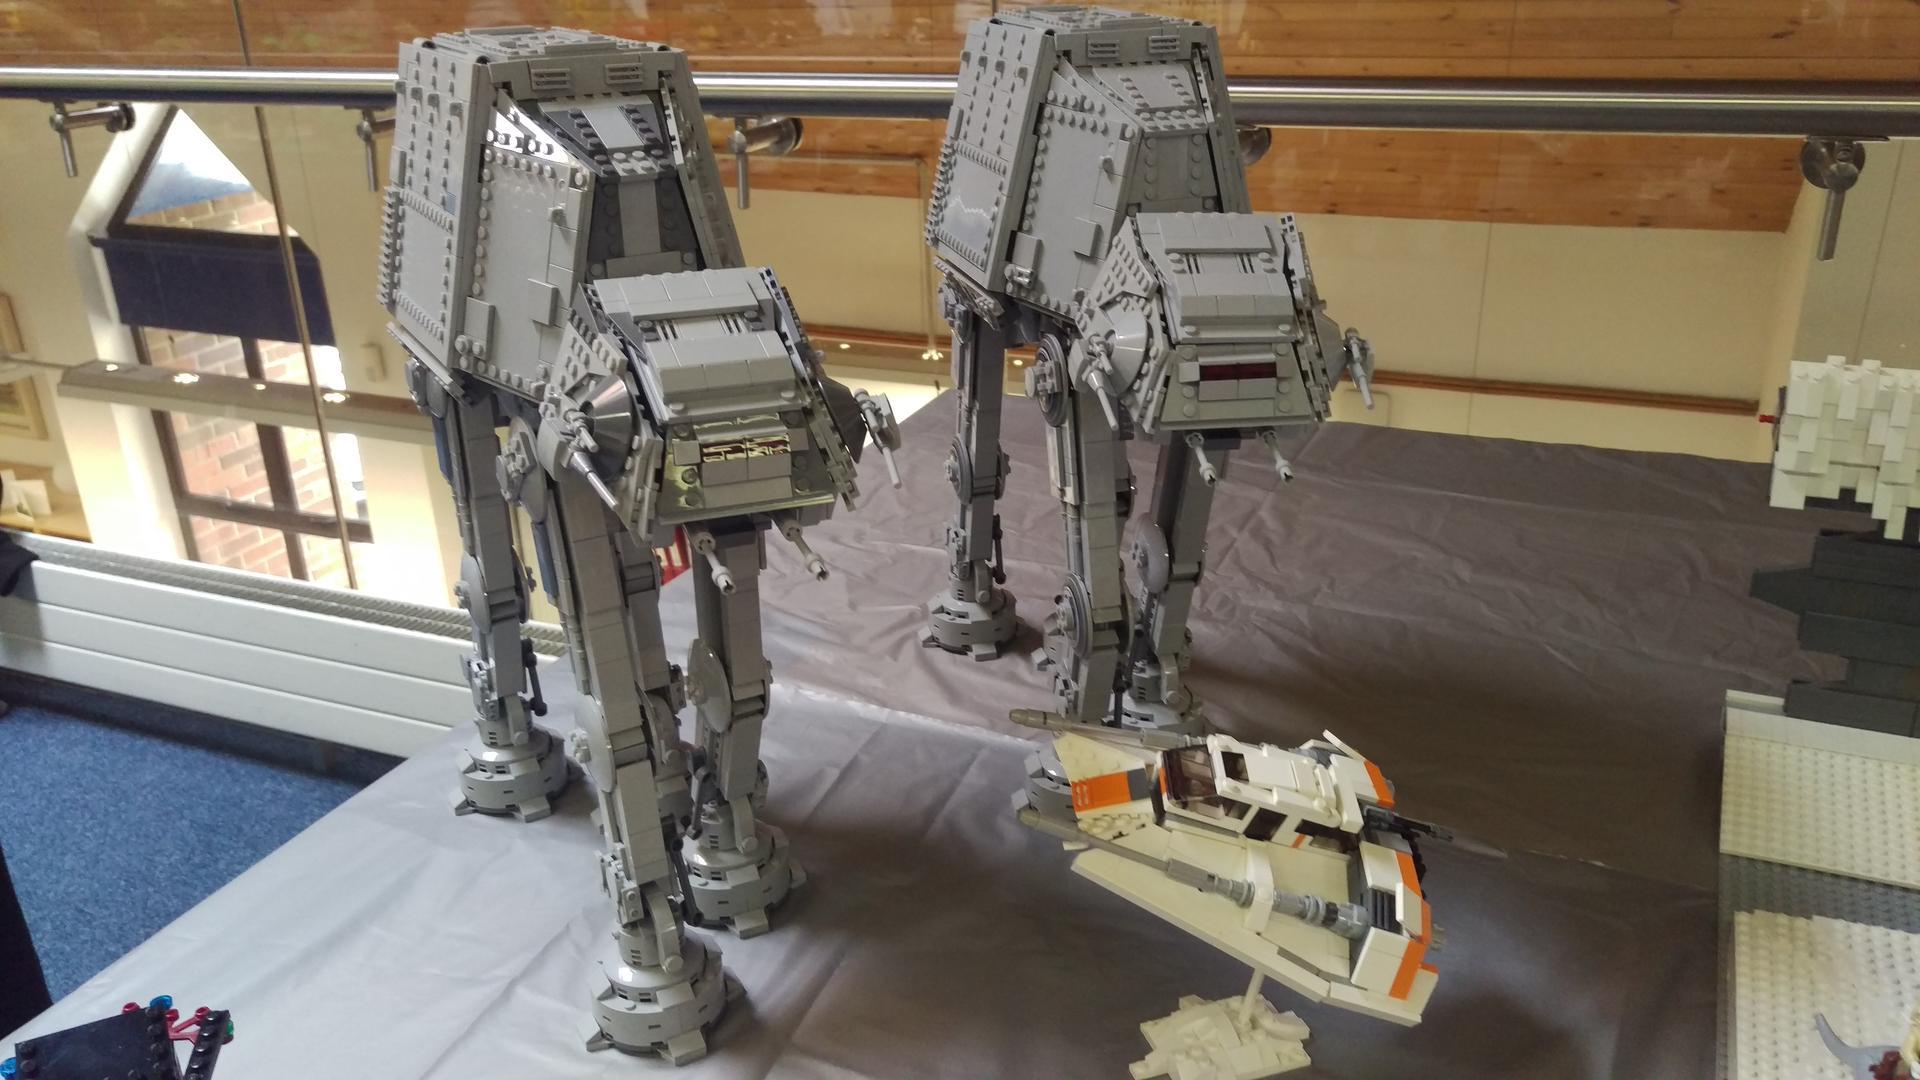 Lego Moc 6006 Plus Size Atat Star Wars 2016 Rebrickable Build